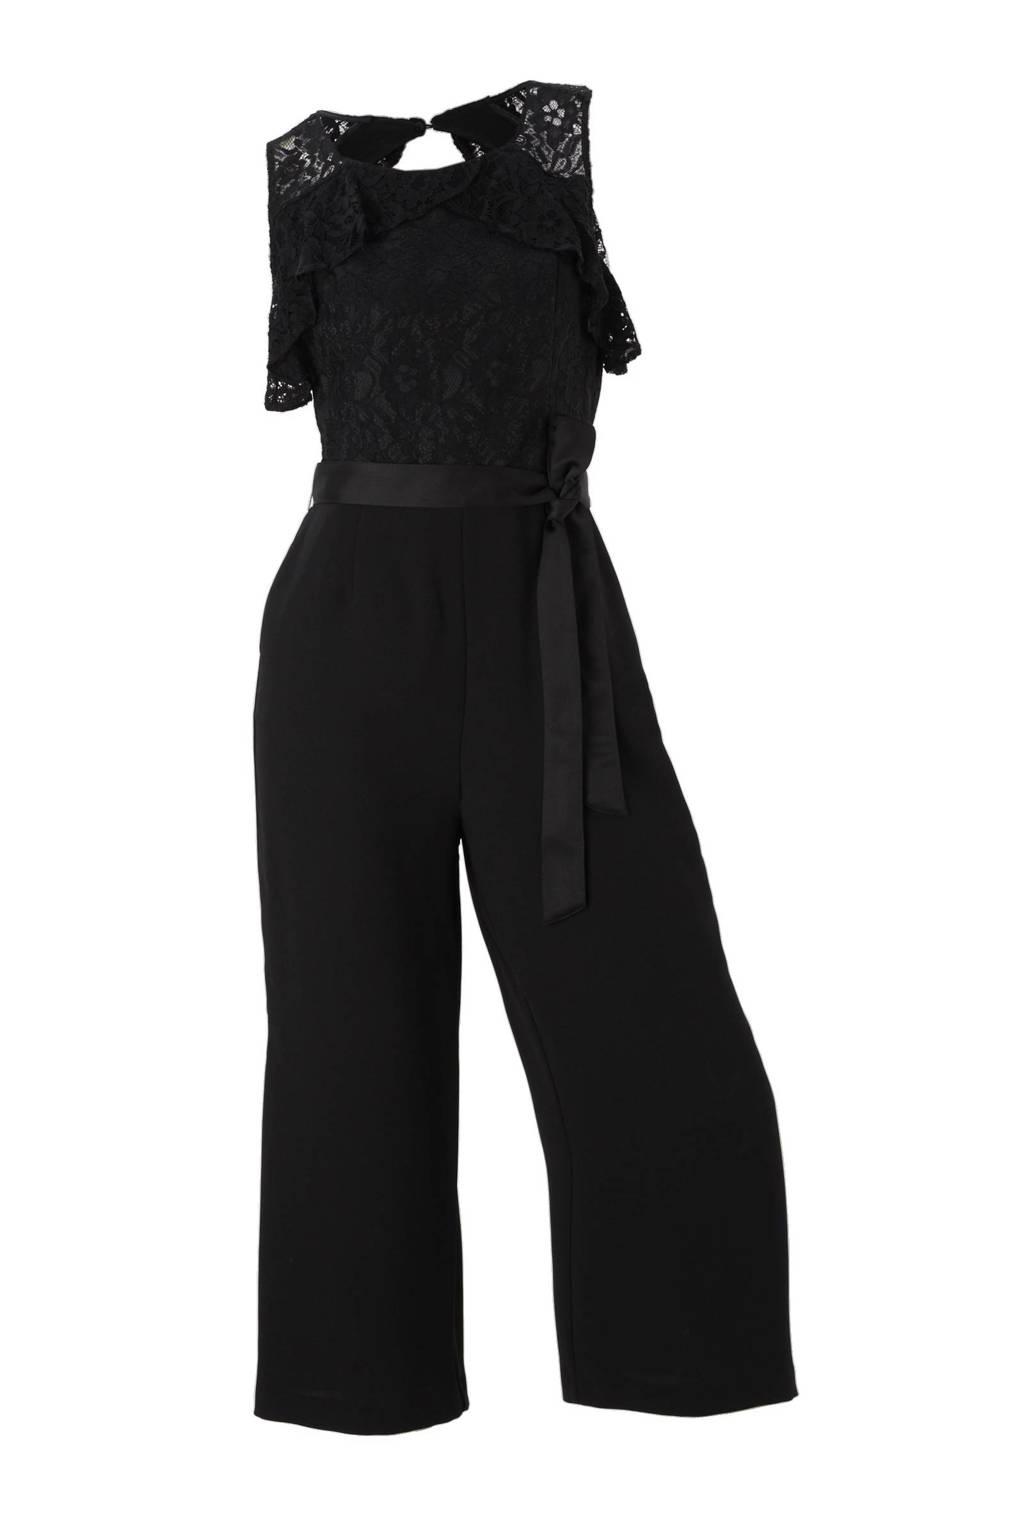 C&A Yessica jumpsuit met kant zwart, Zwart